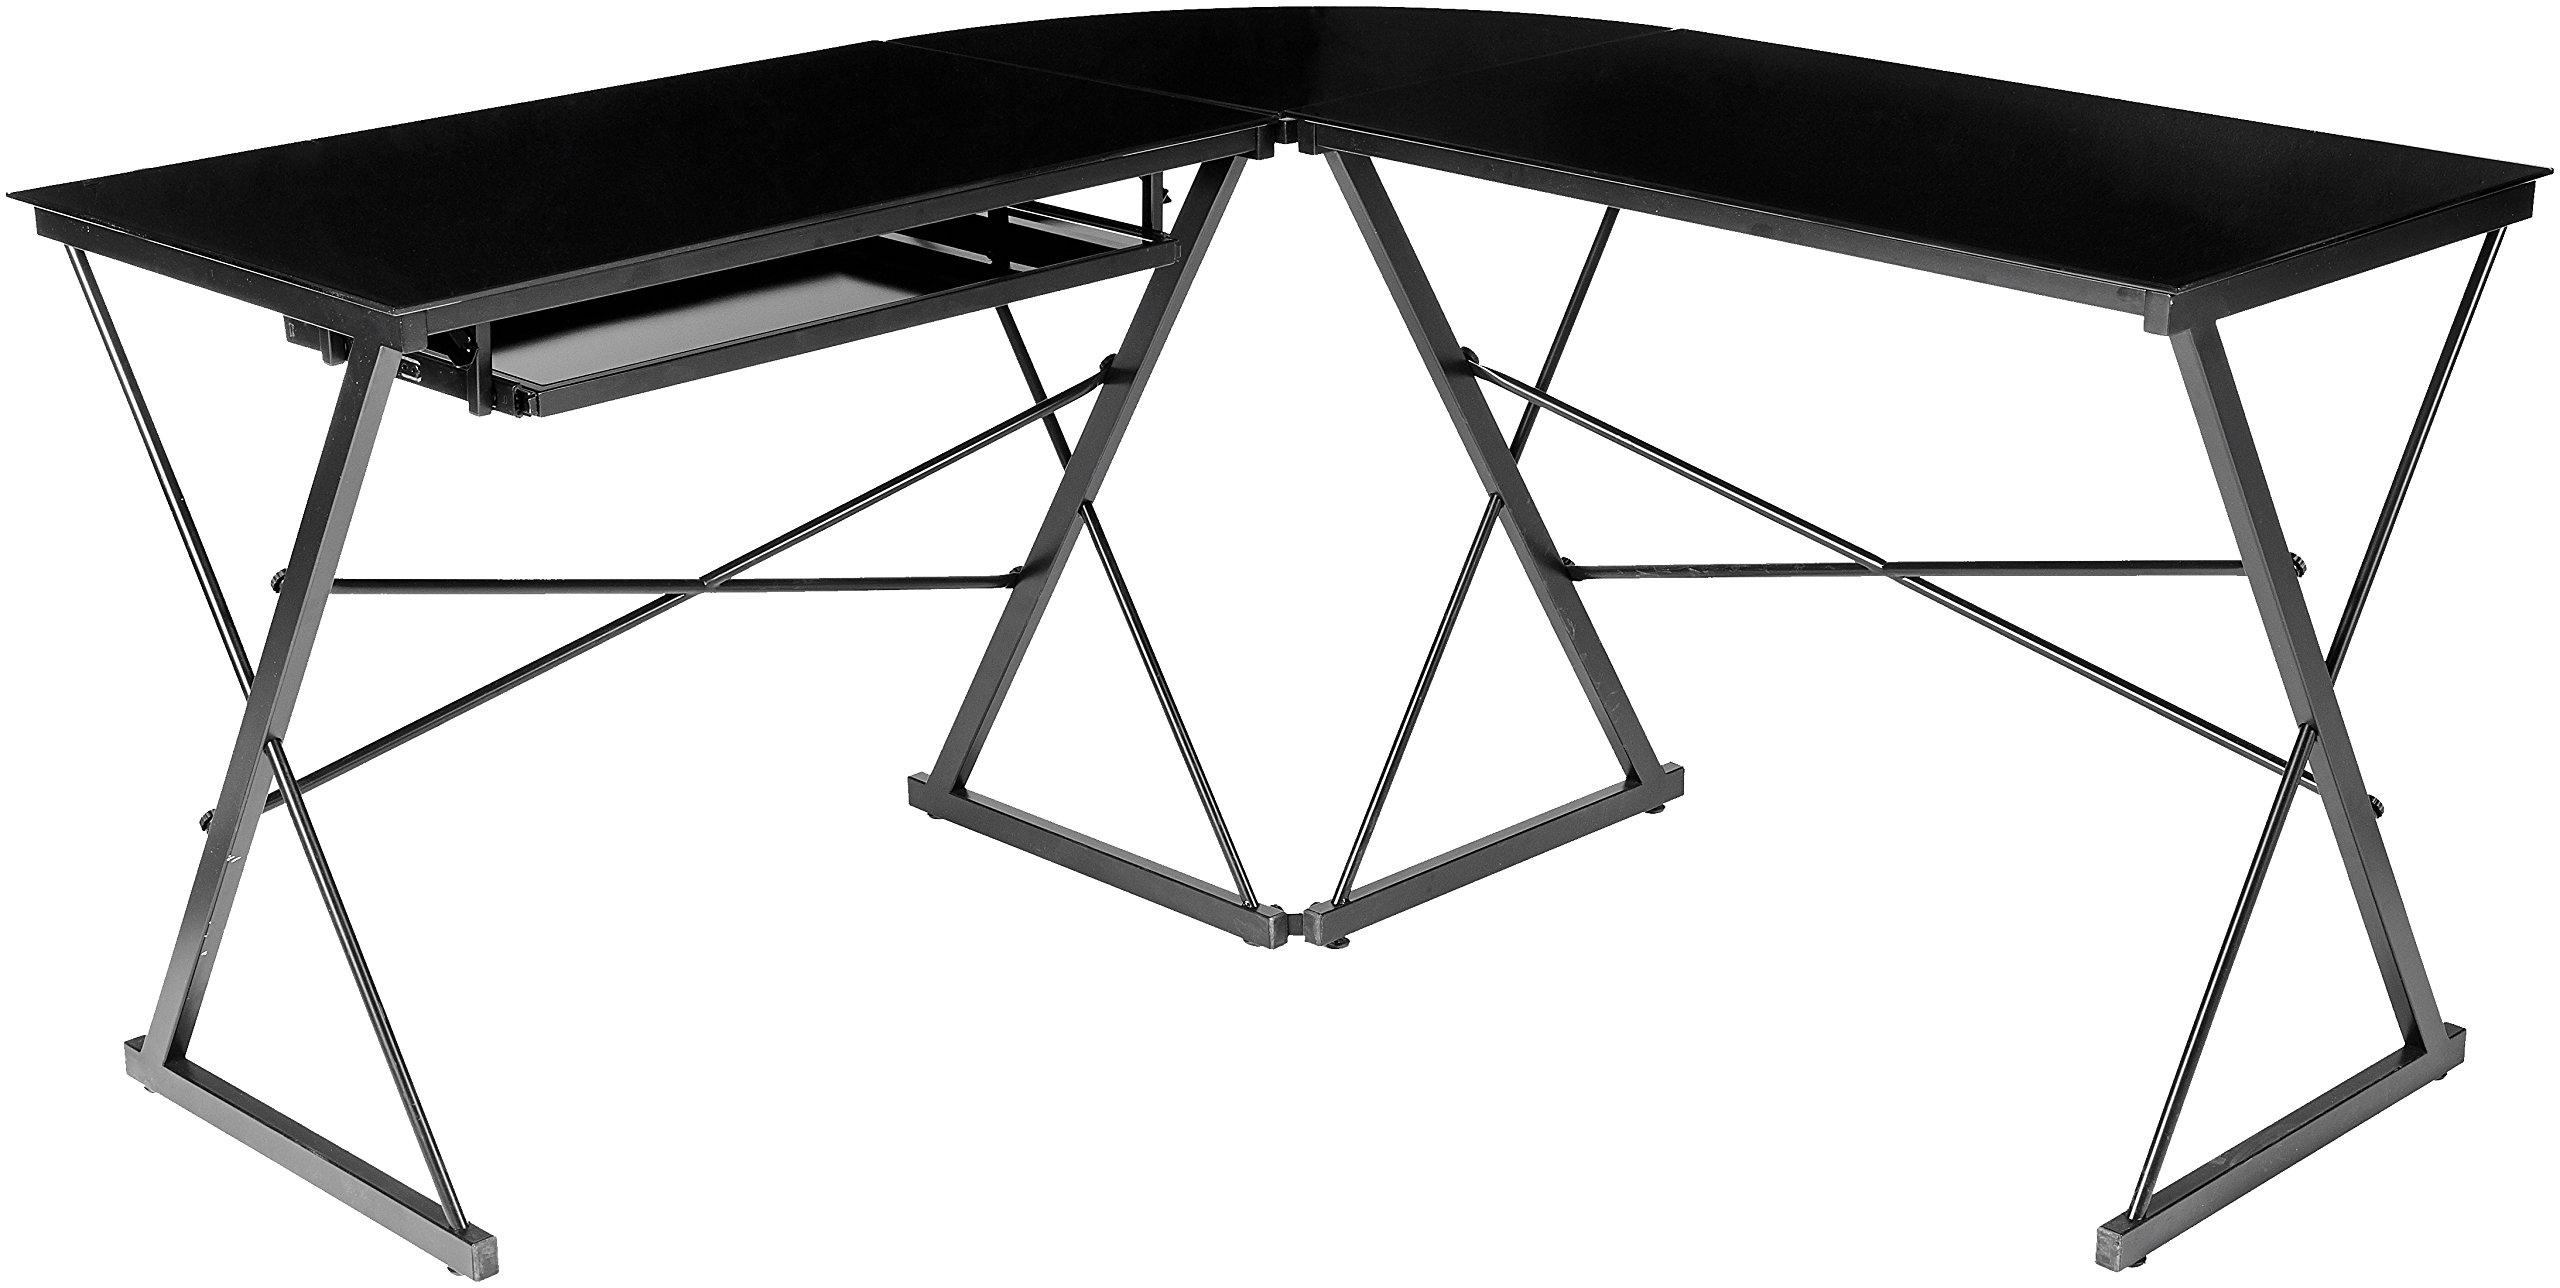 AmazonBasics Three Piece Corner Gaming Computer Desk - Black with Black Glass by AmazonBasics